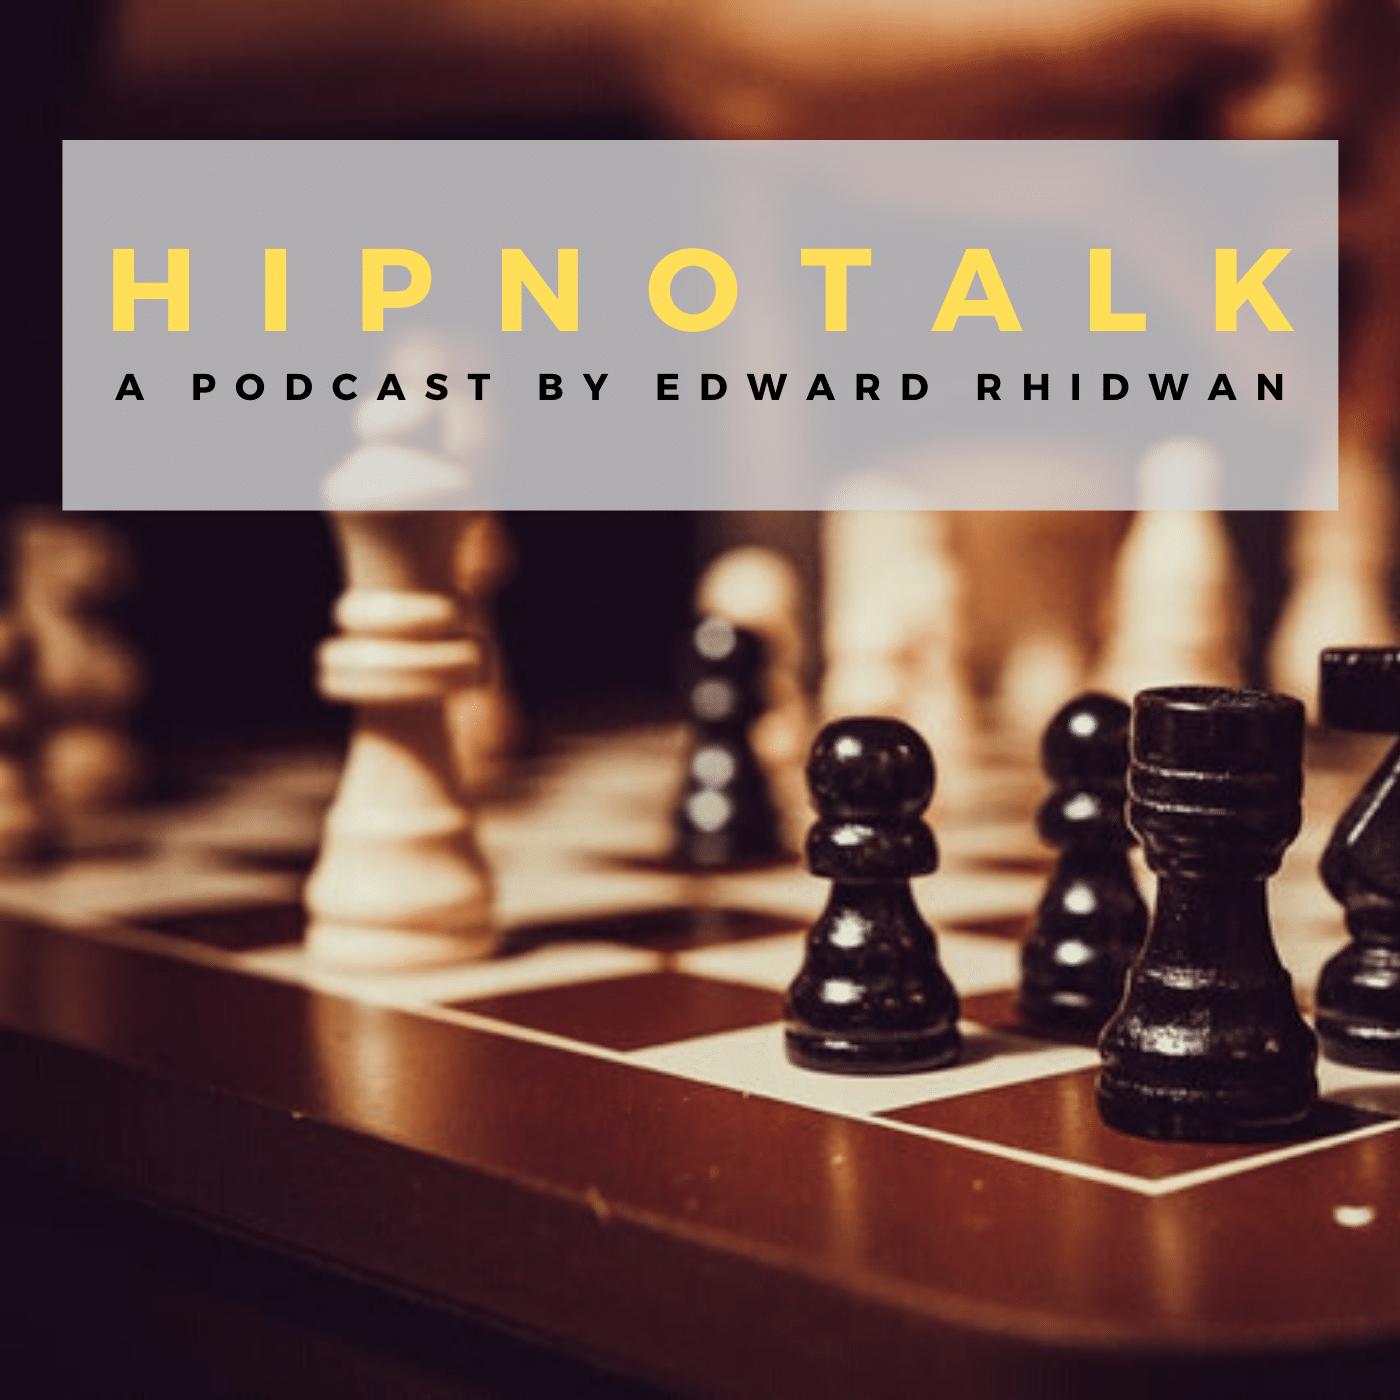 Podcast motivasi dan pengembangan diri by Edward Rhidwan